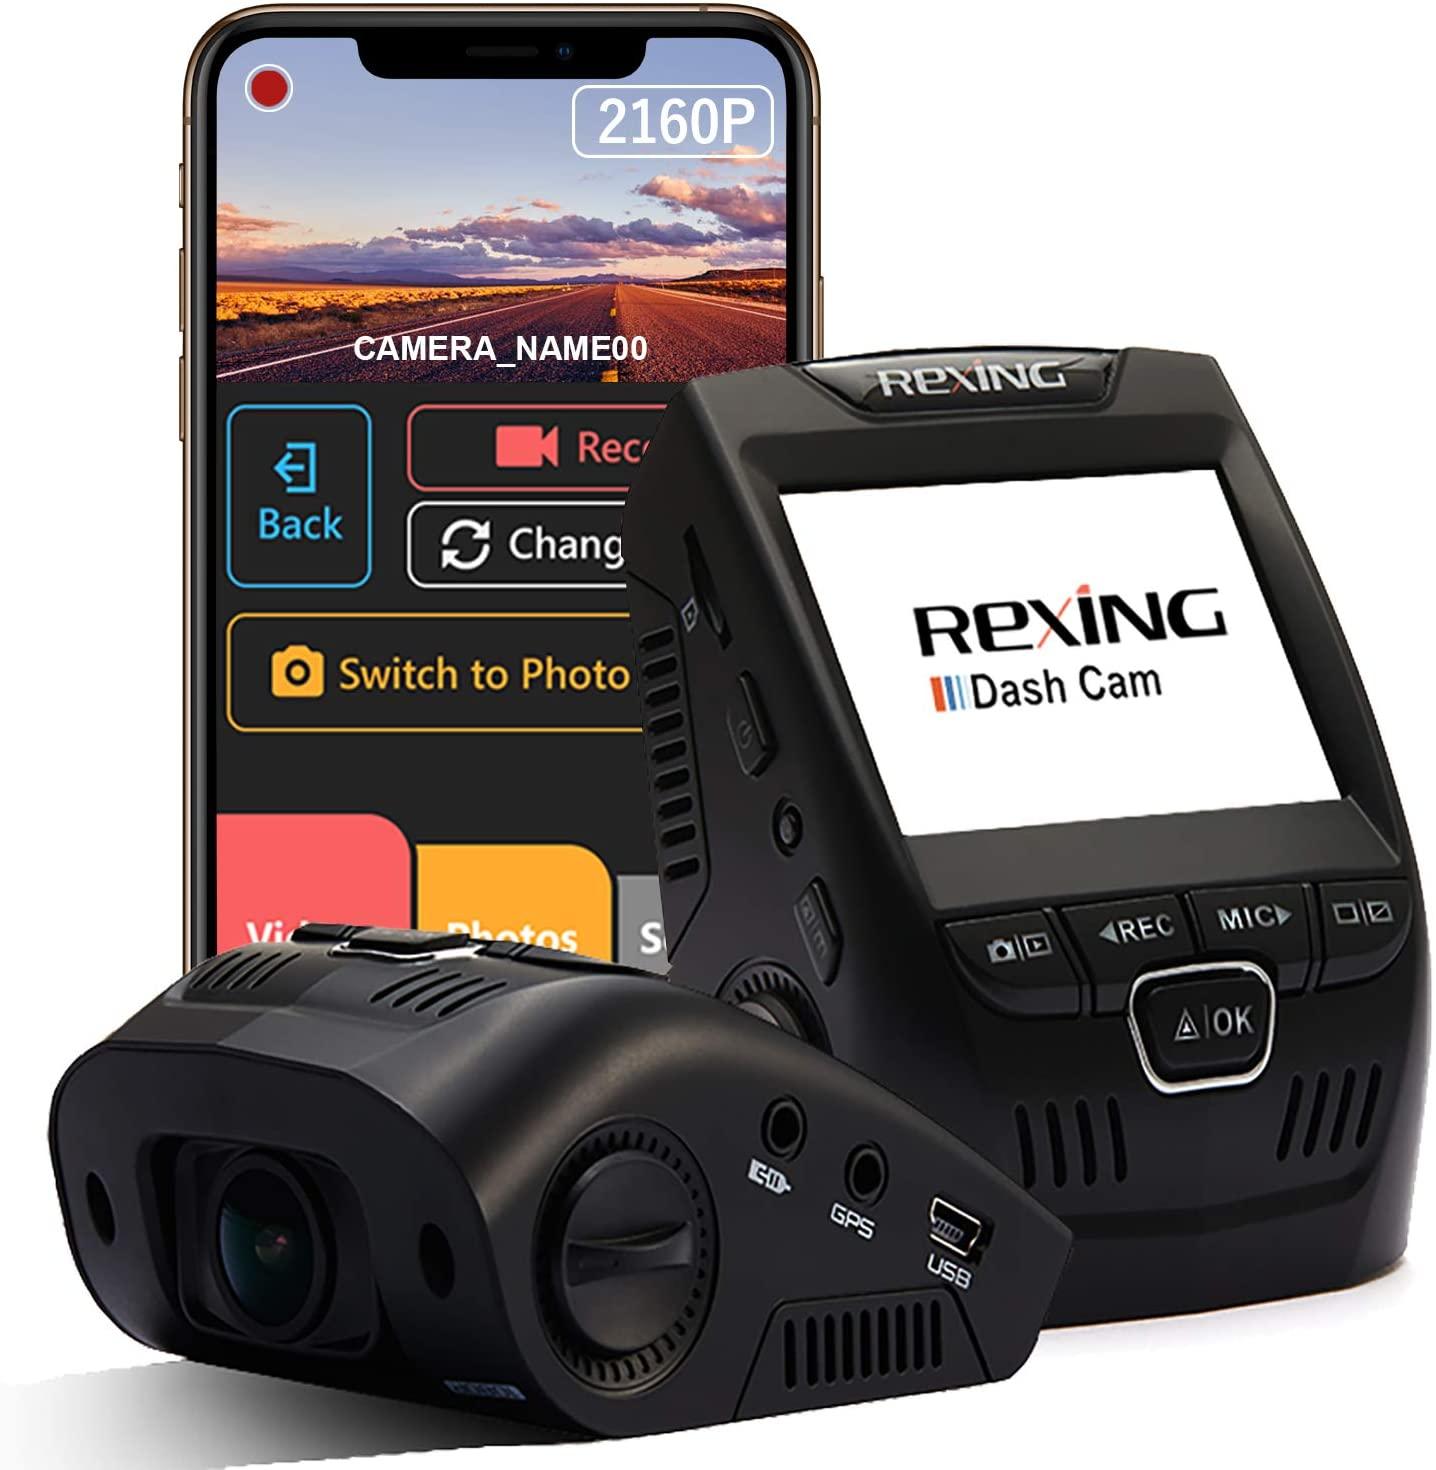 Rexing DashCam coupon: Rexing V1-4K